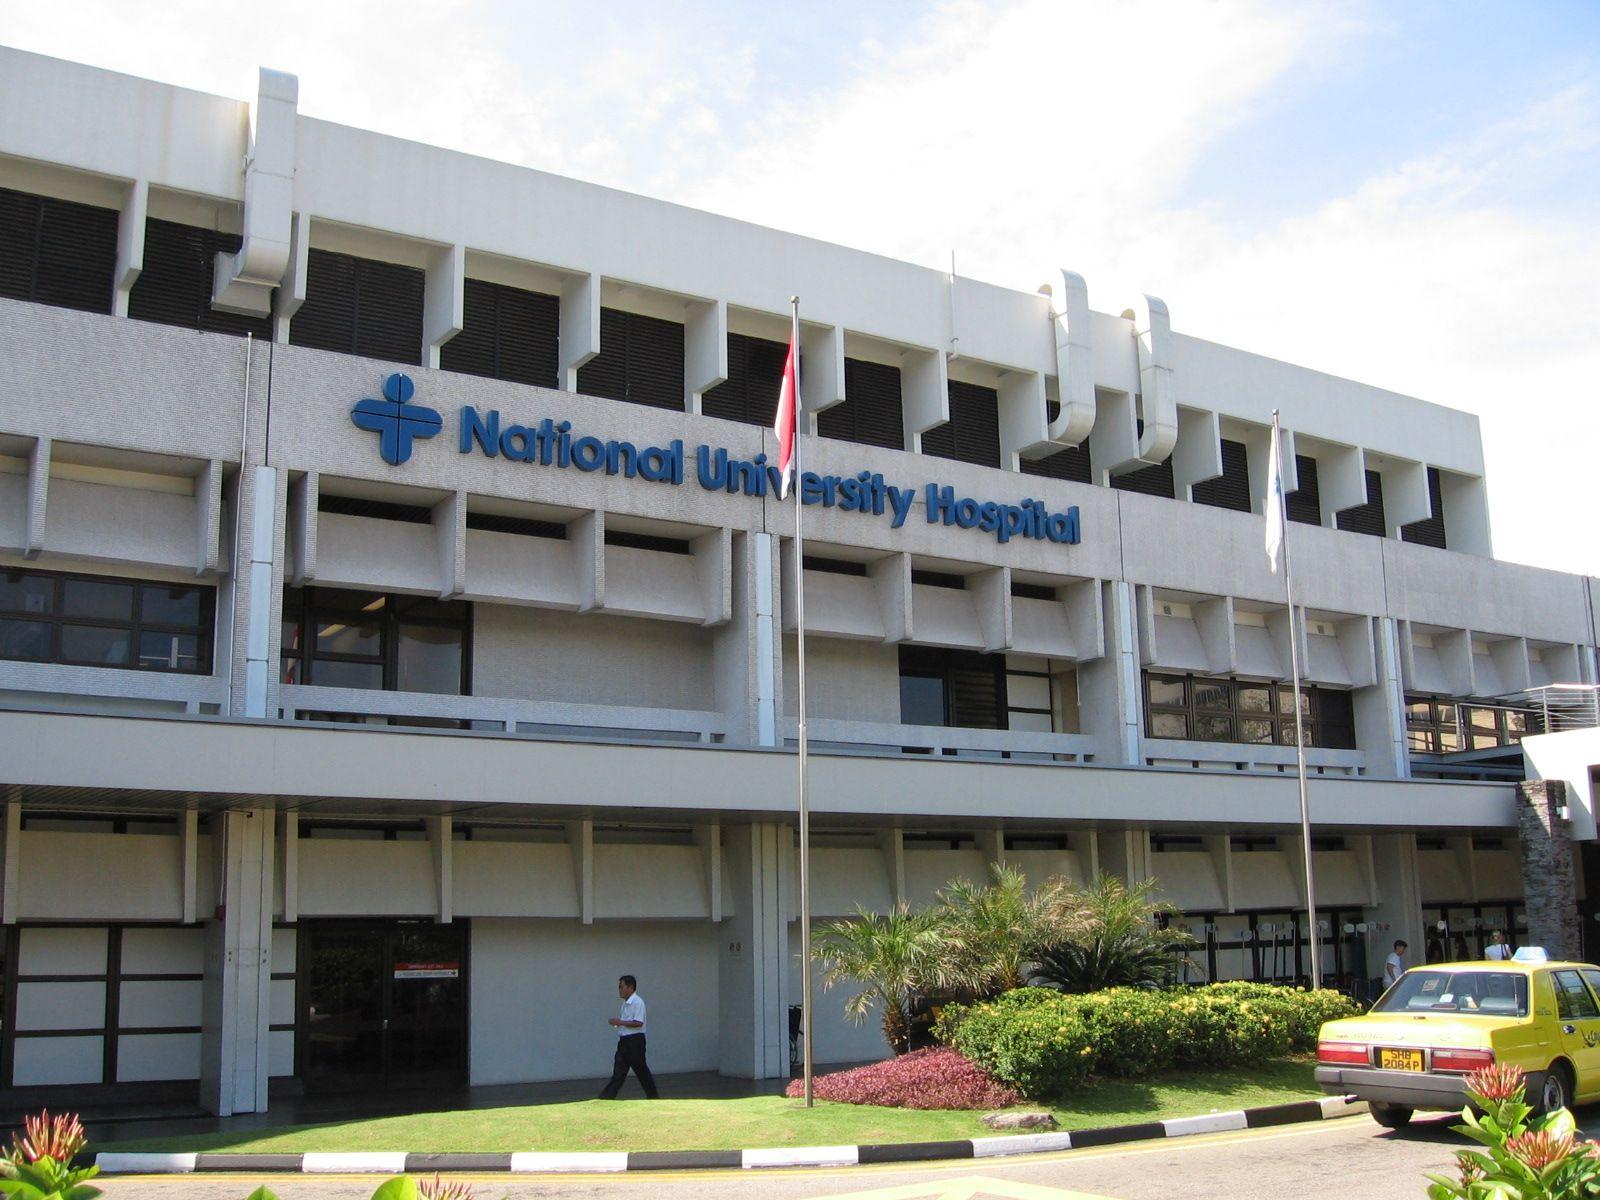 National University Hospital Address: 5 Lower Kent Ridge Rd